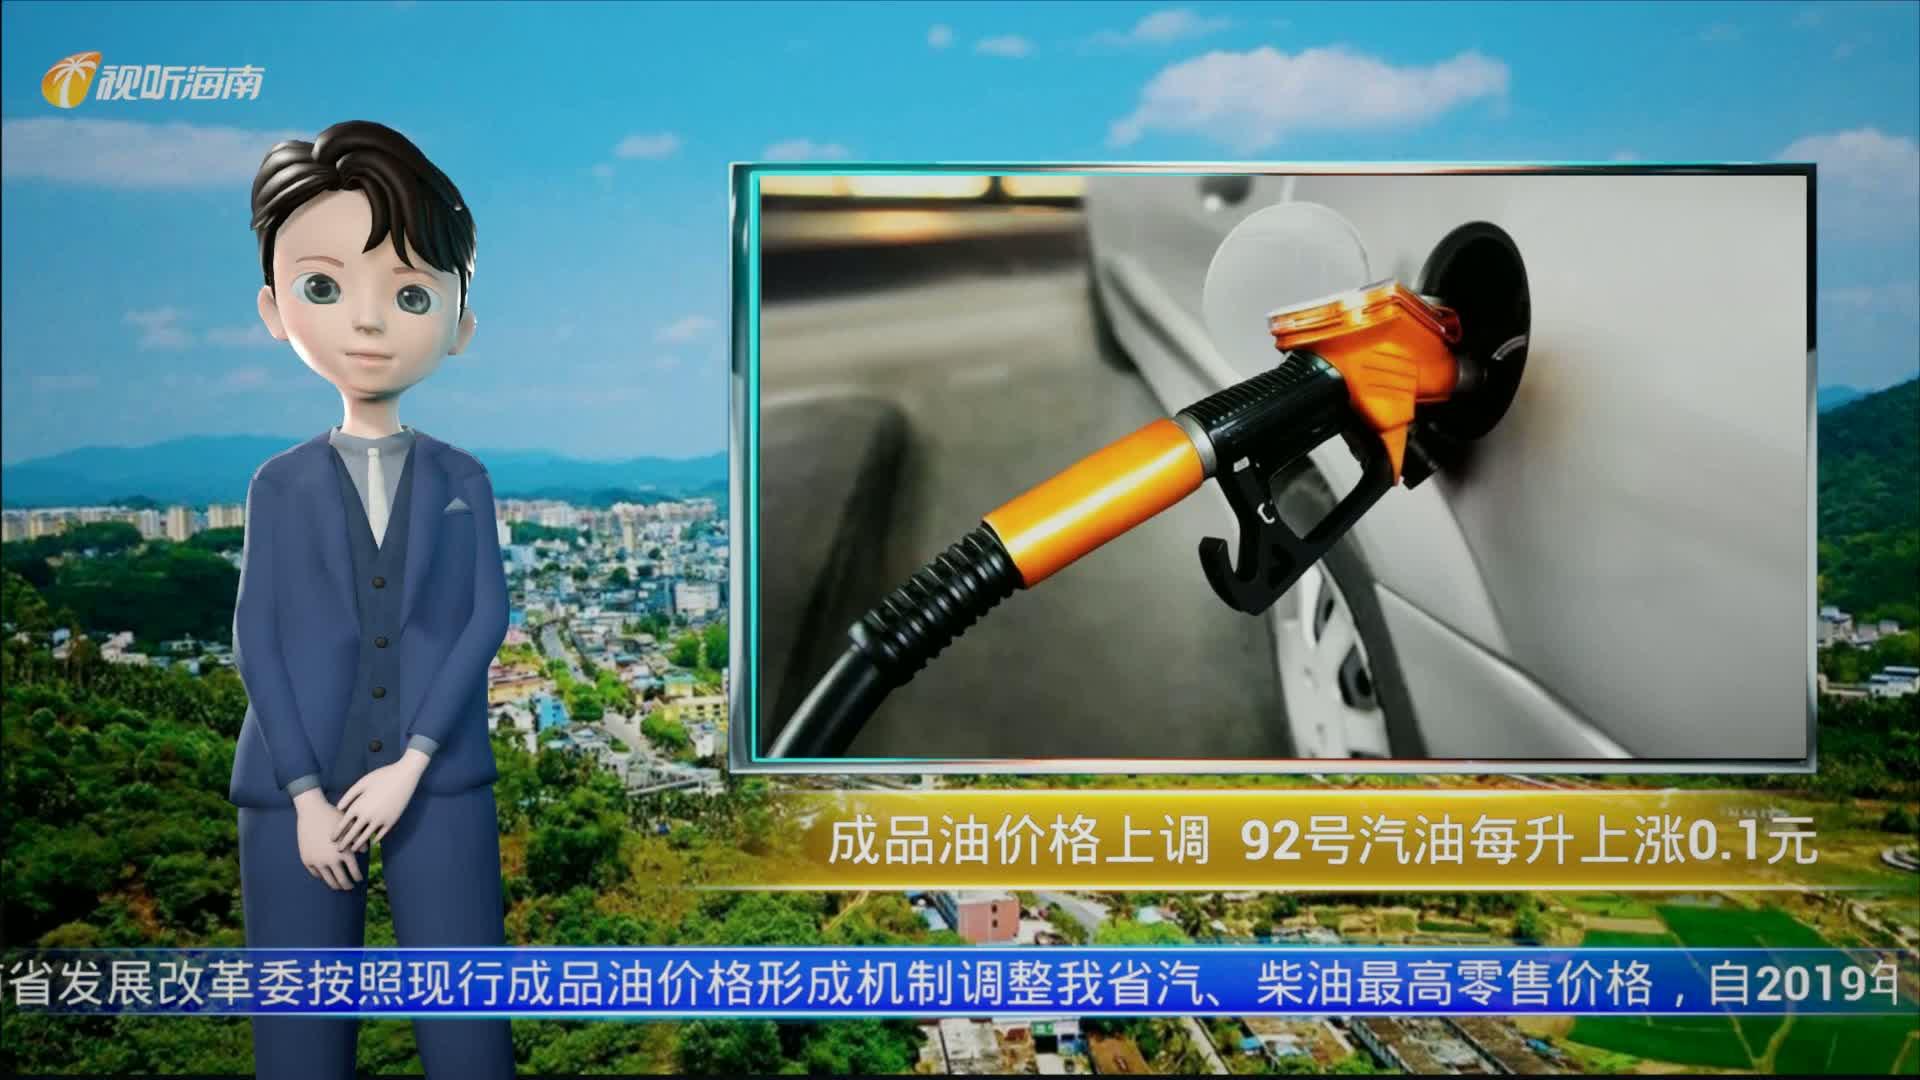 AI播报|海南成品油价格今起上调 92号汽油每升上涨0.1元